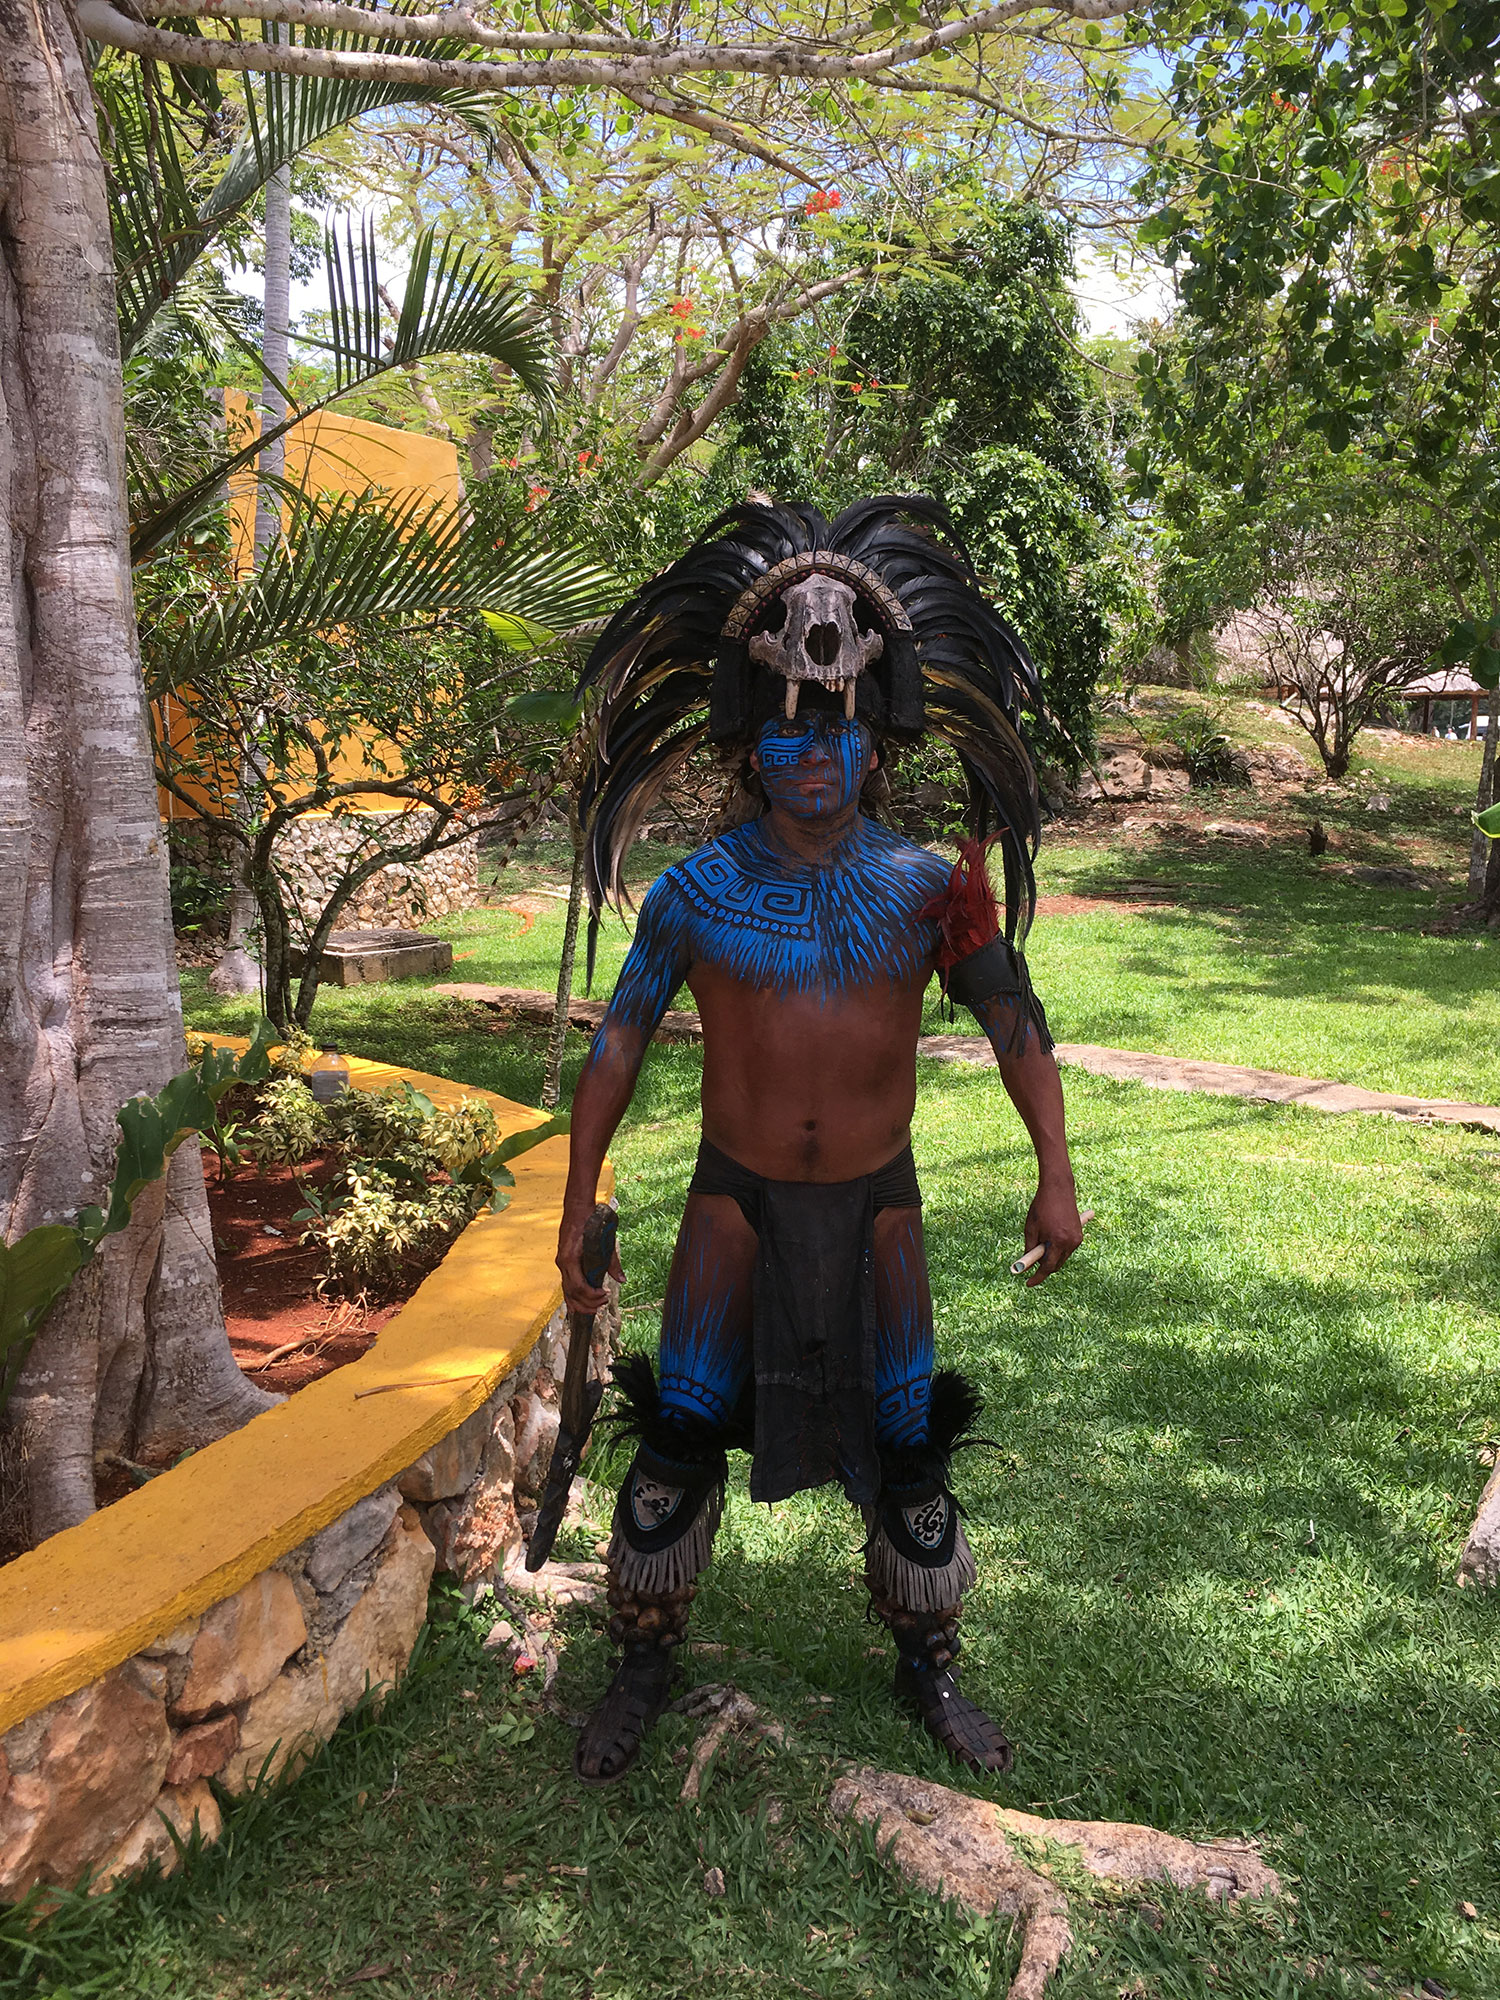 Hammocks_and_Ruins_What_to_Do_Mexico_Mayan_pyramid_cenote_Ik_Kil_7.jpg